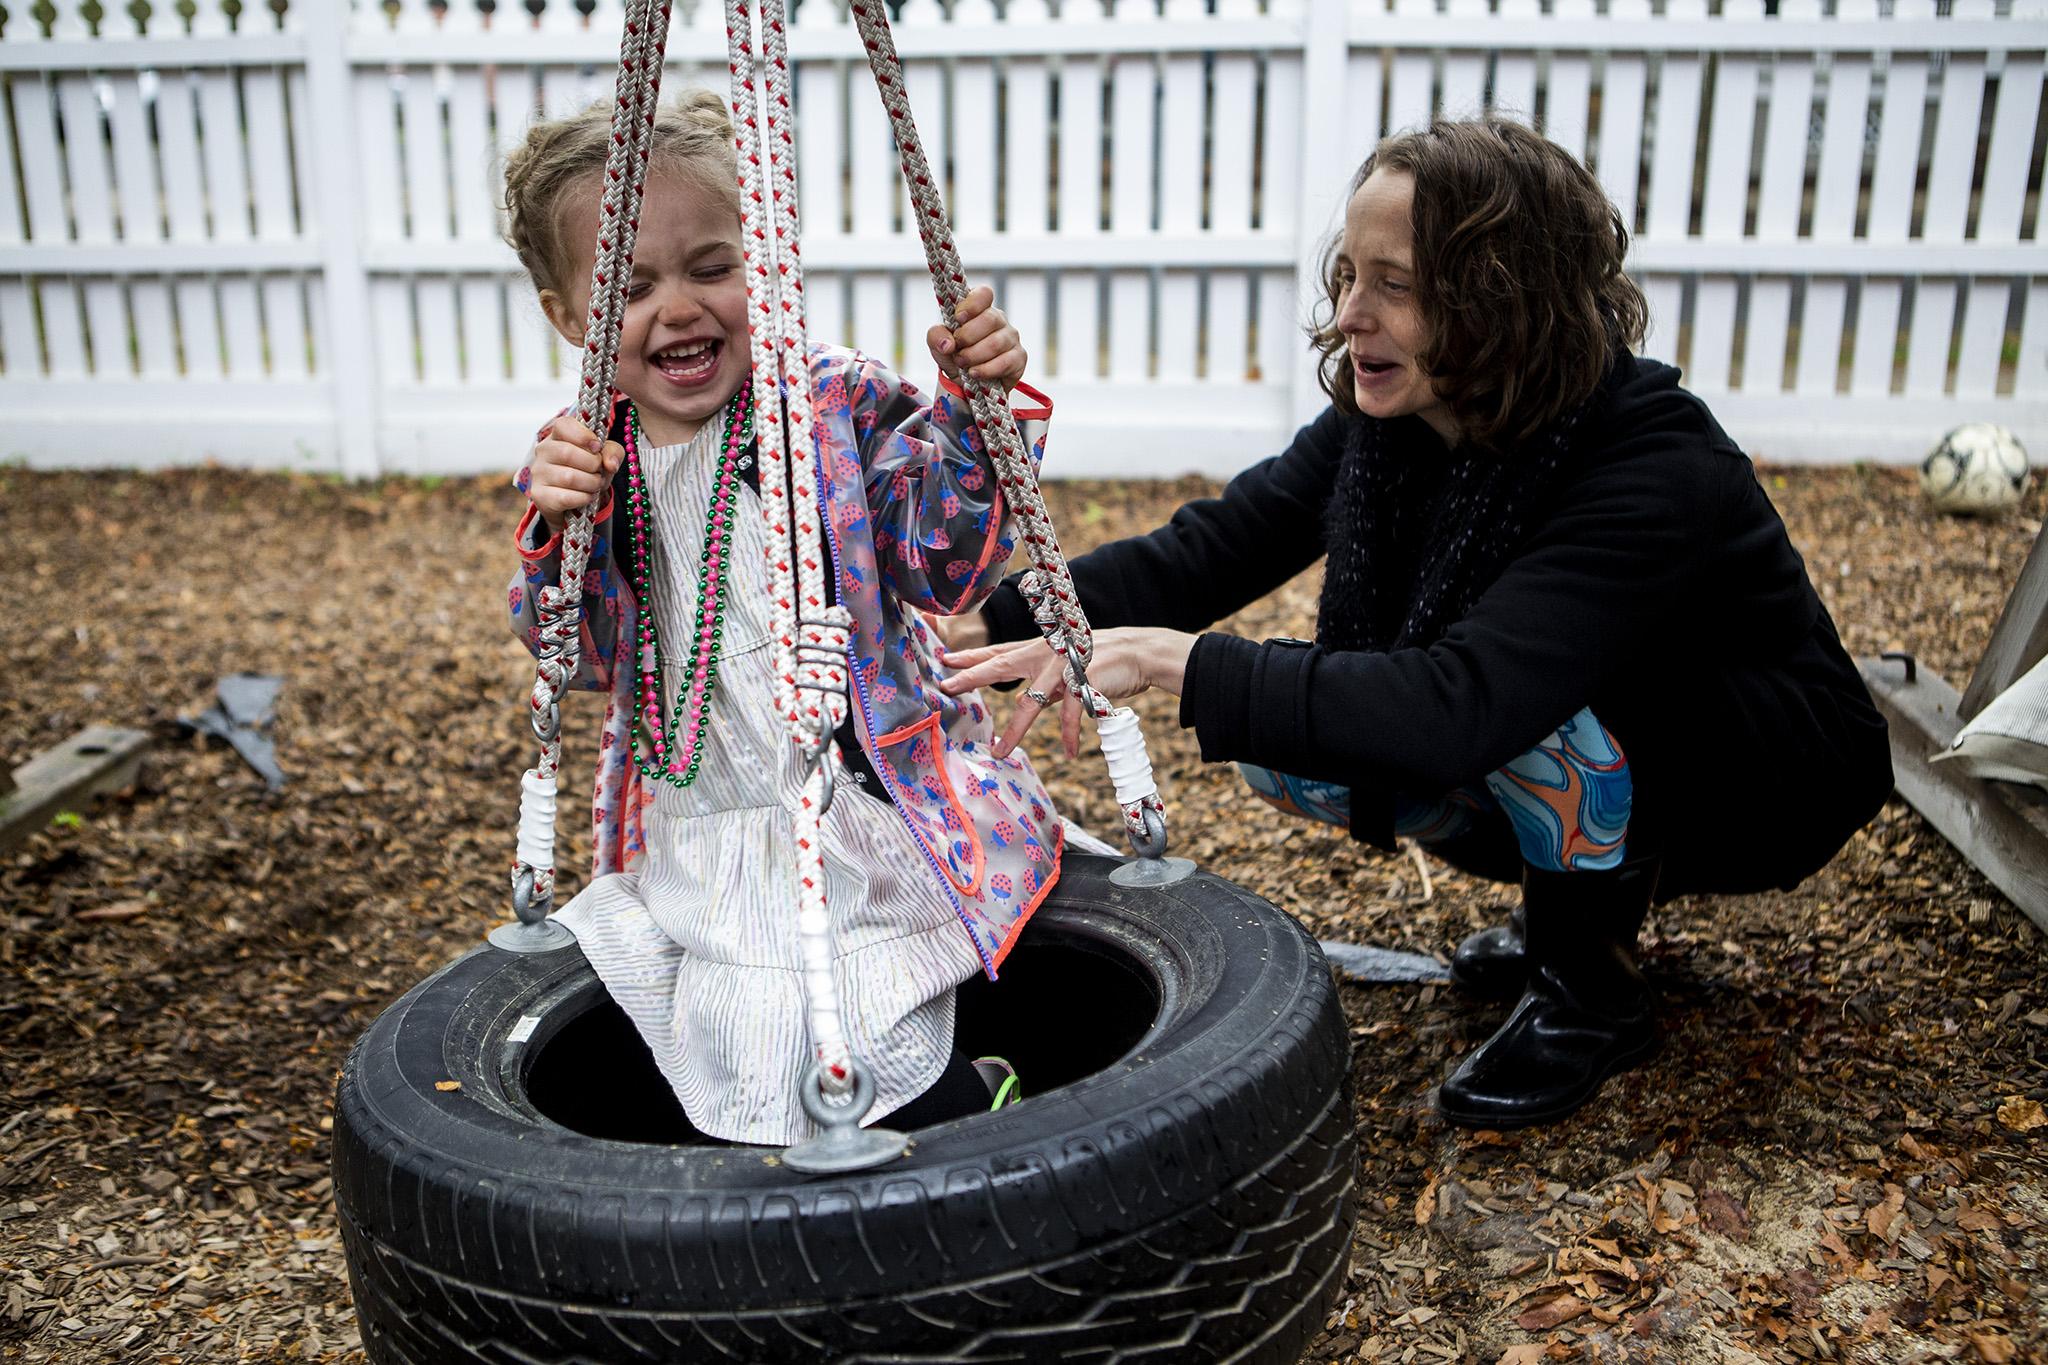 fun-tire-swing-family-portriat.jpg